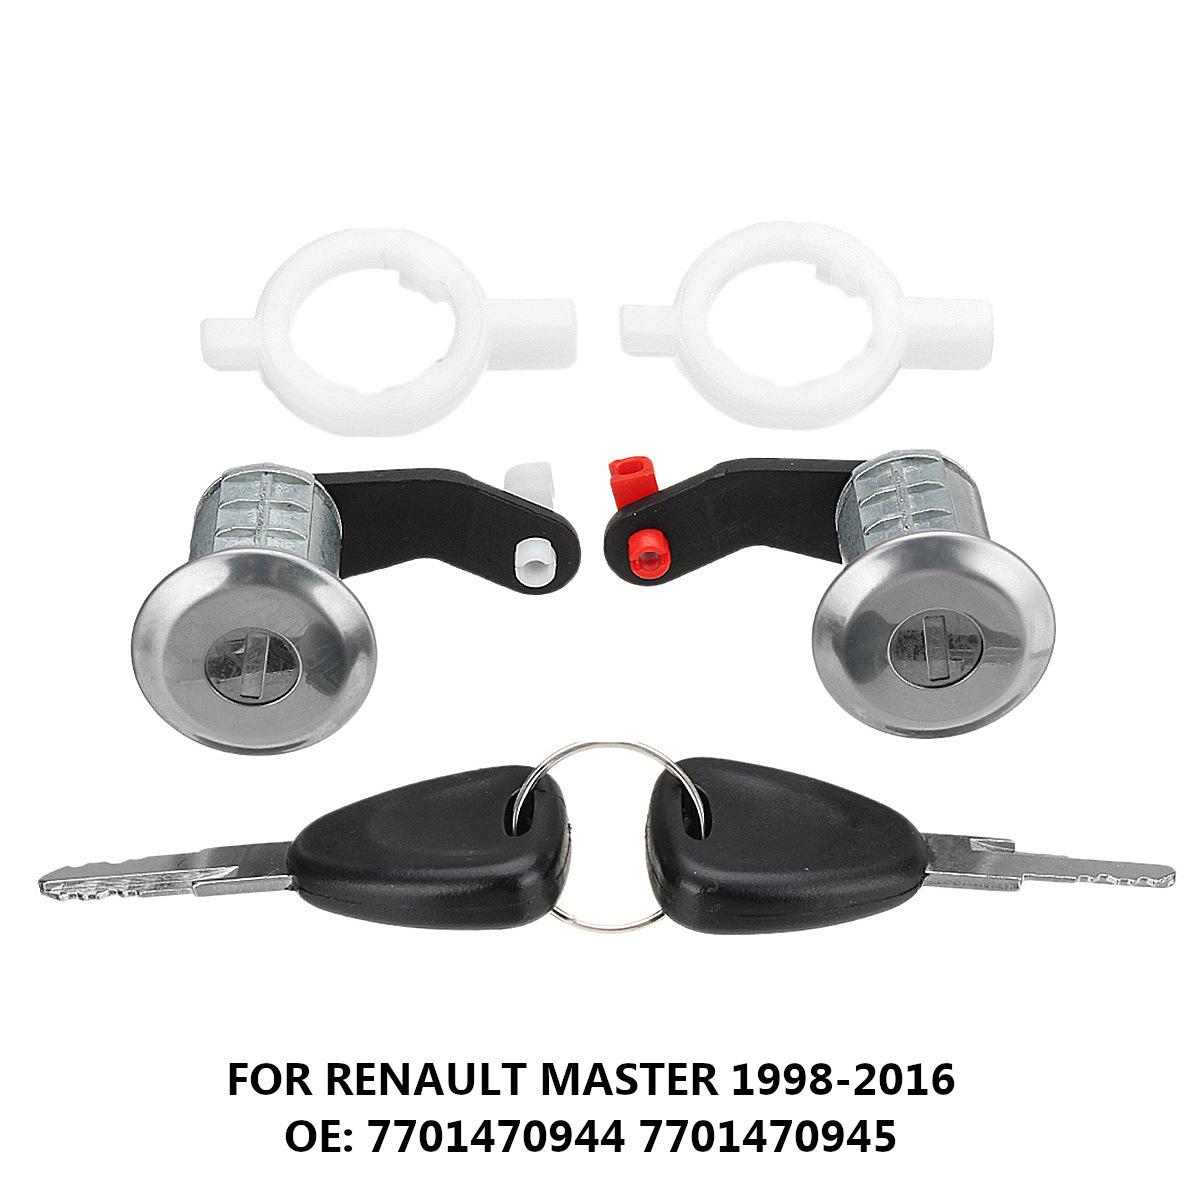 For Renault Master Door Lock Core Barrel Set Lh Rh 2 Keys OE:7701470944 7701470945